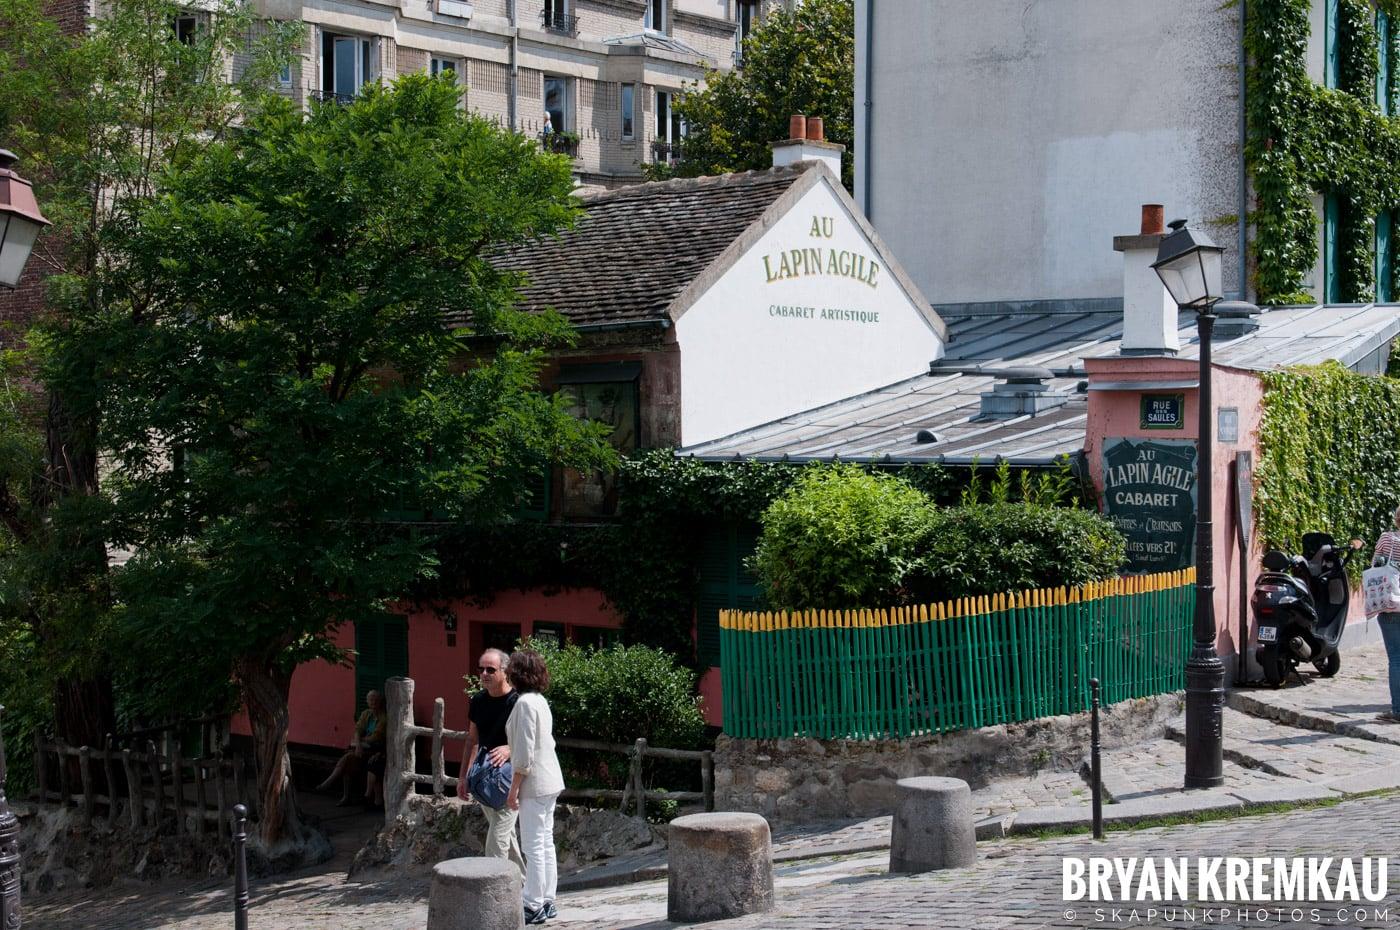 Paris, France Honeymoon - Day 6 - 7.23.11 (26)